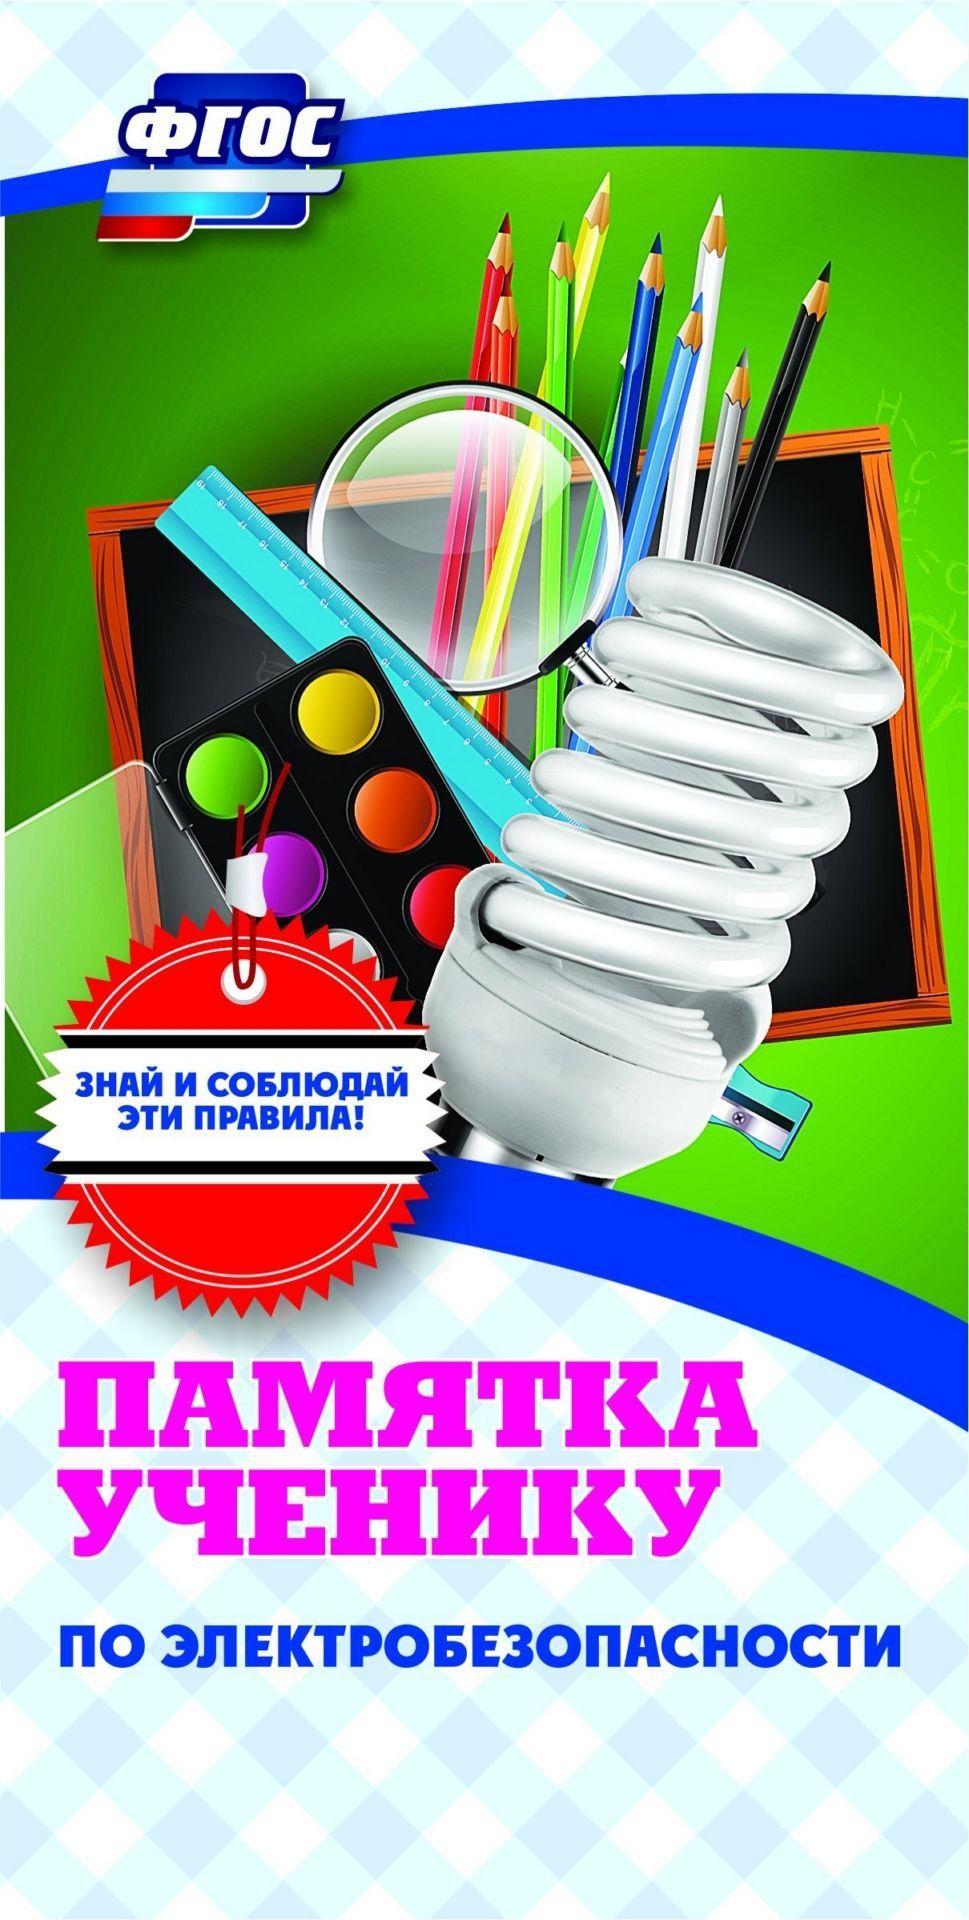 Памятка ученику по электробезопасностиНачальная школа<br>Бумага офсетная.<br><br>Год: 2018